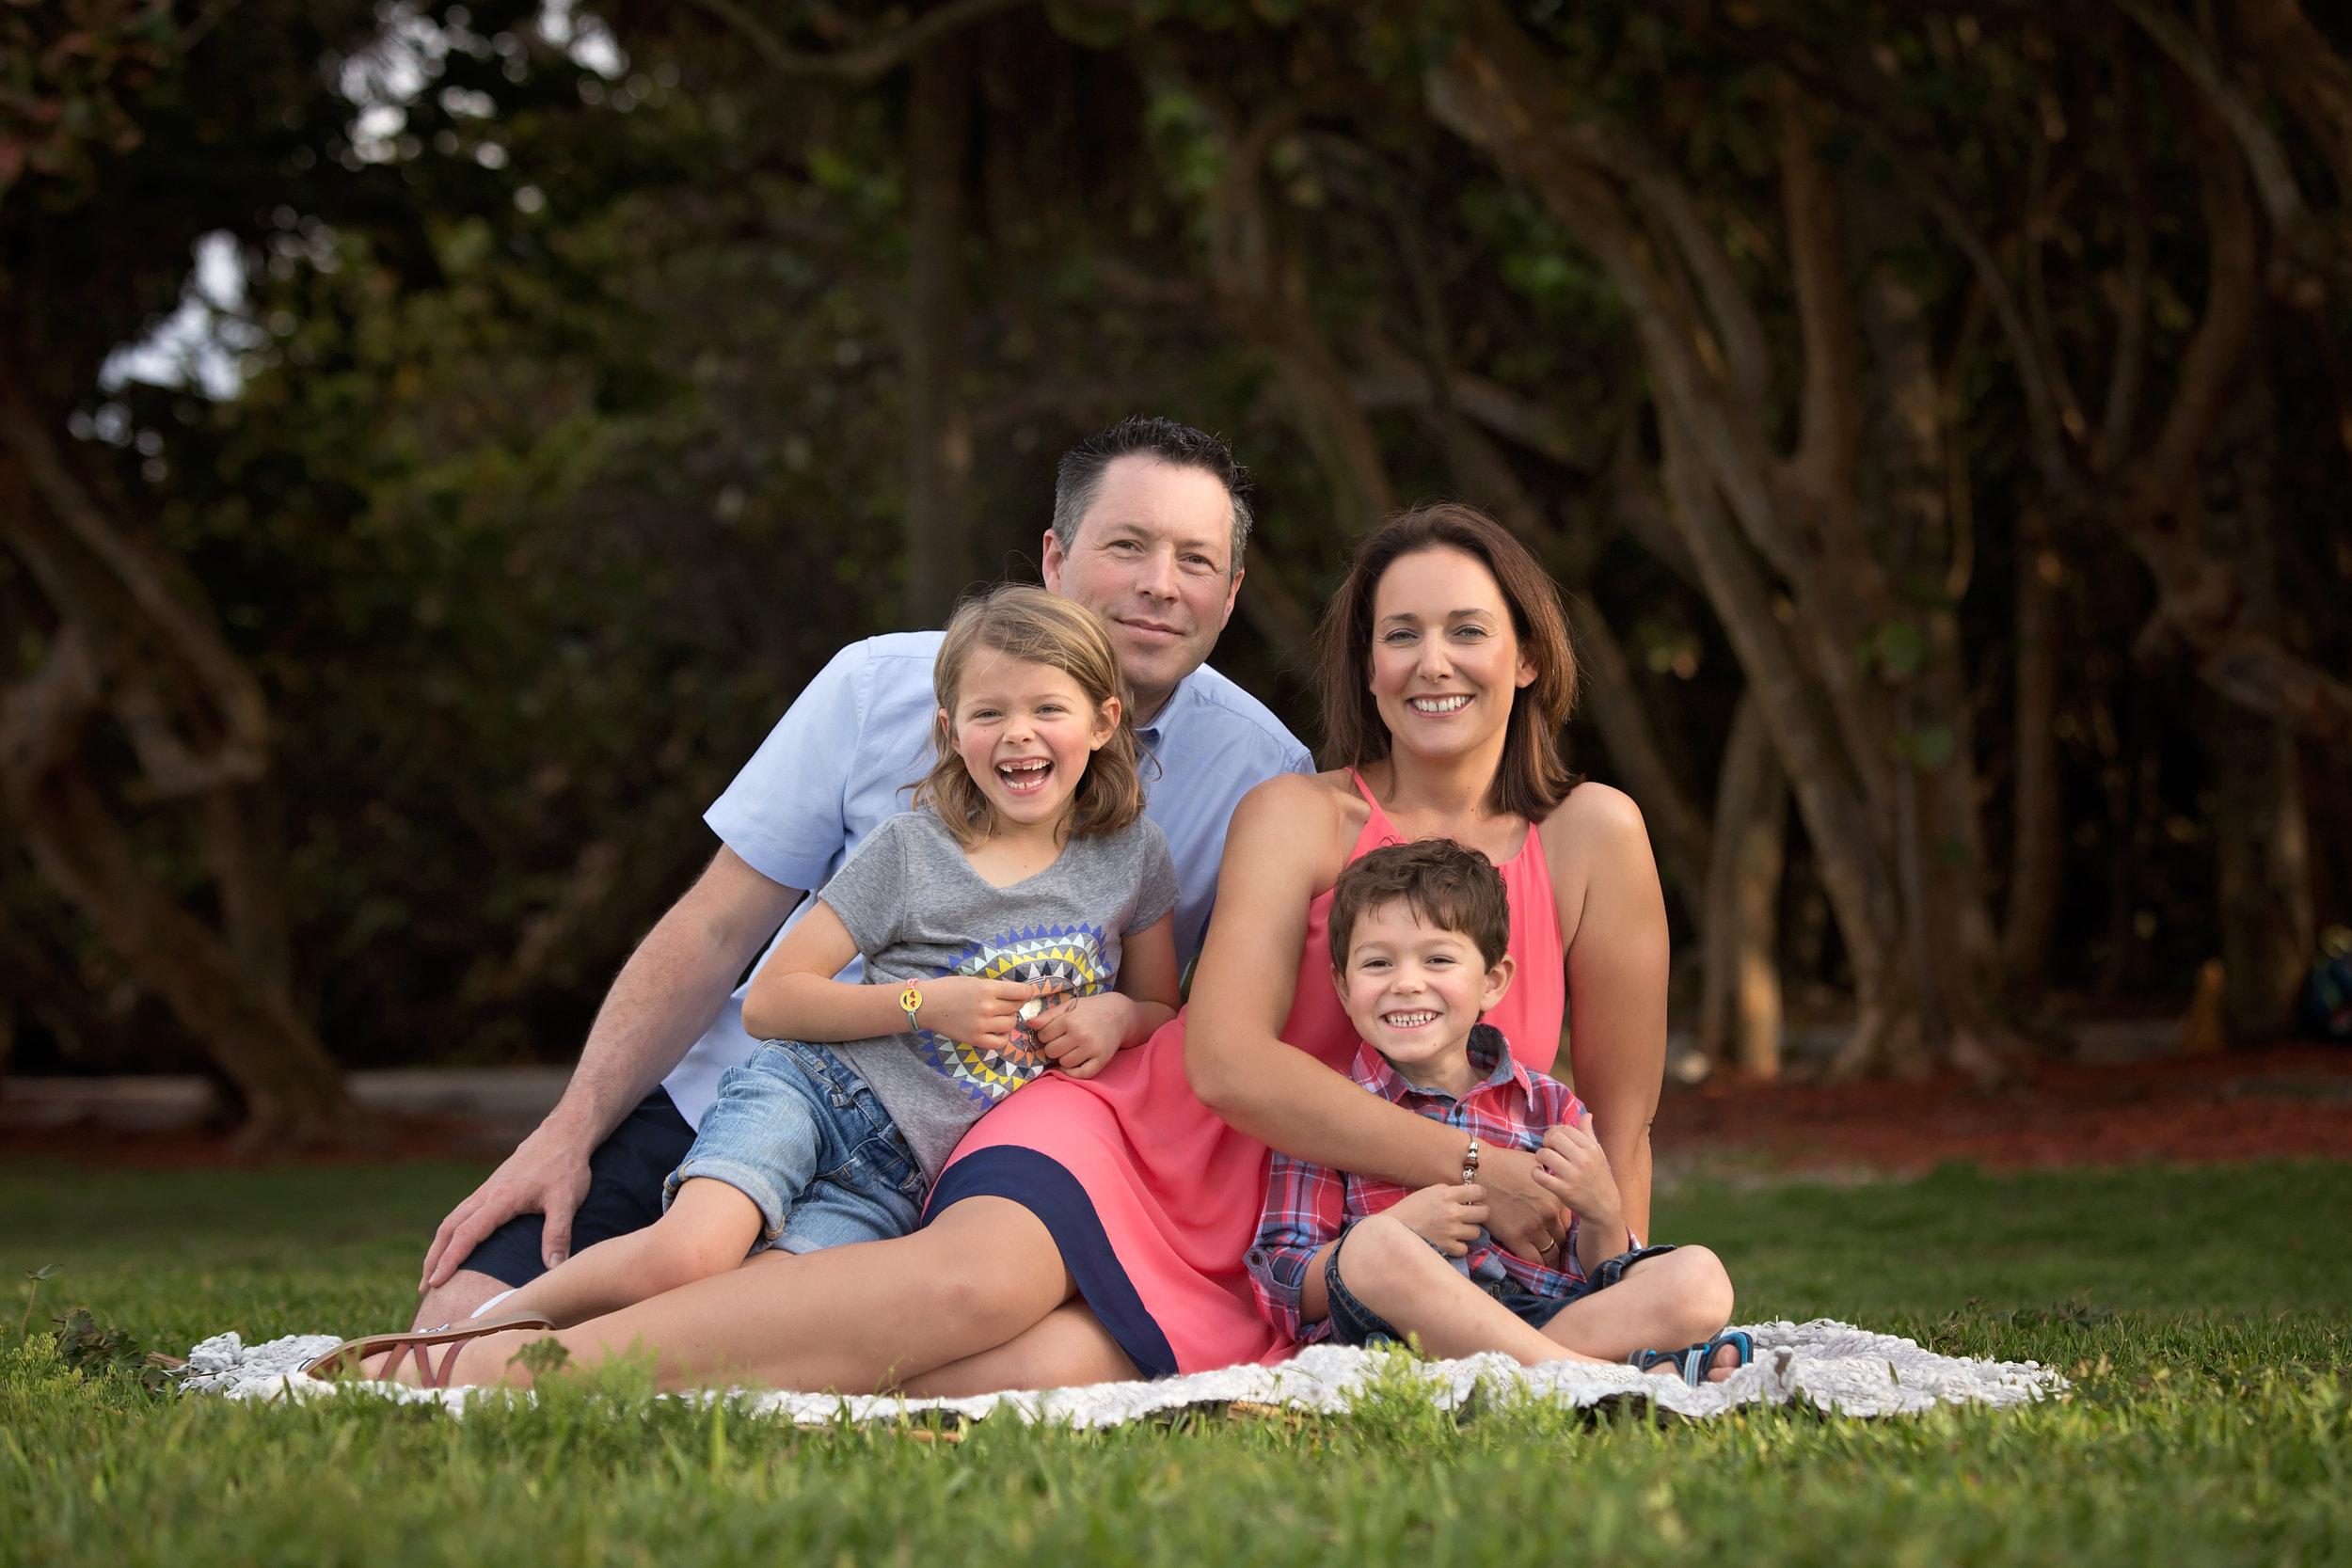 boca-raton-child-photographer-parkland-family-photographer-coral-springs-wellington-lake-worth-boynton-lantana-alissa-delucca-photography-park-family.jpg